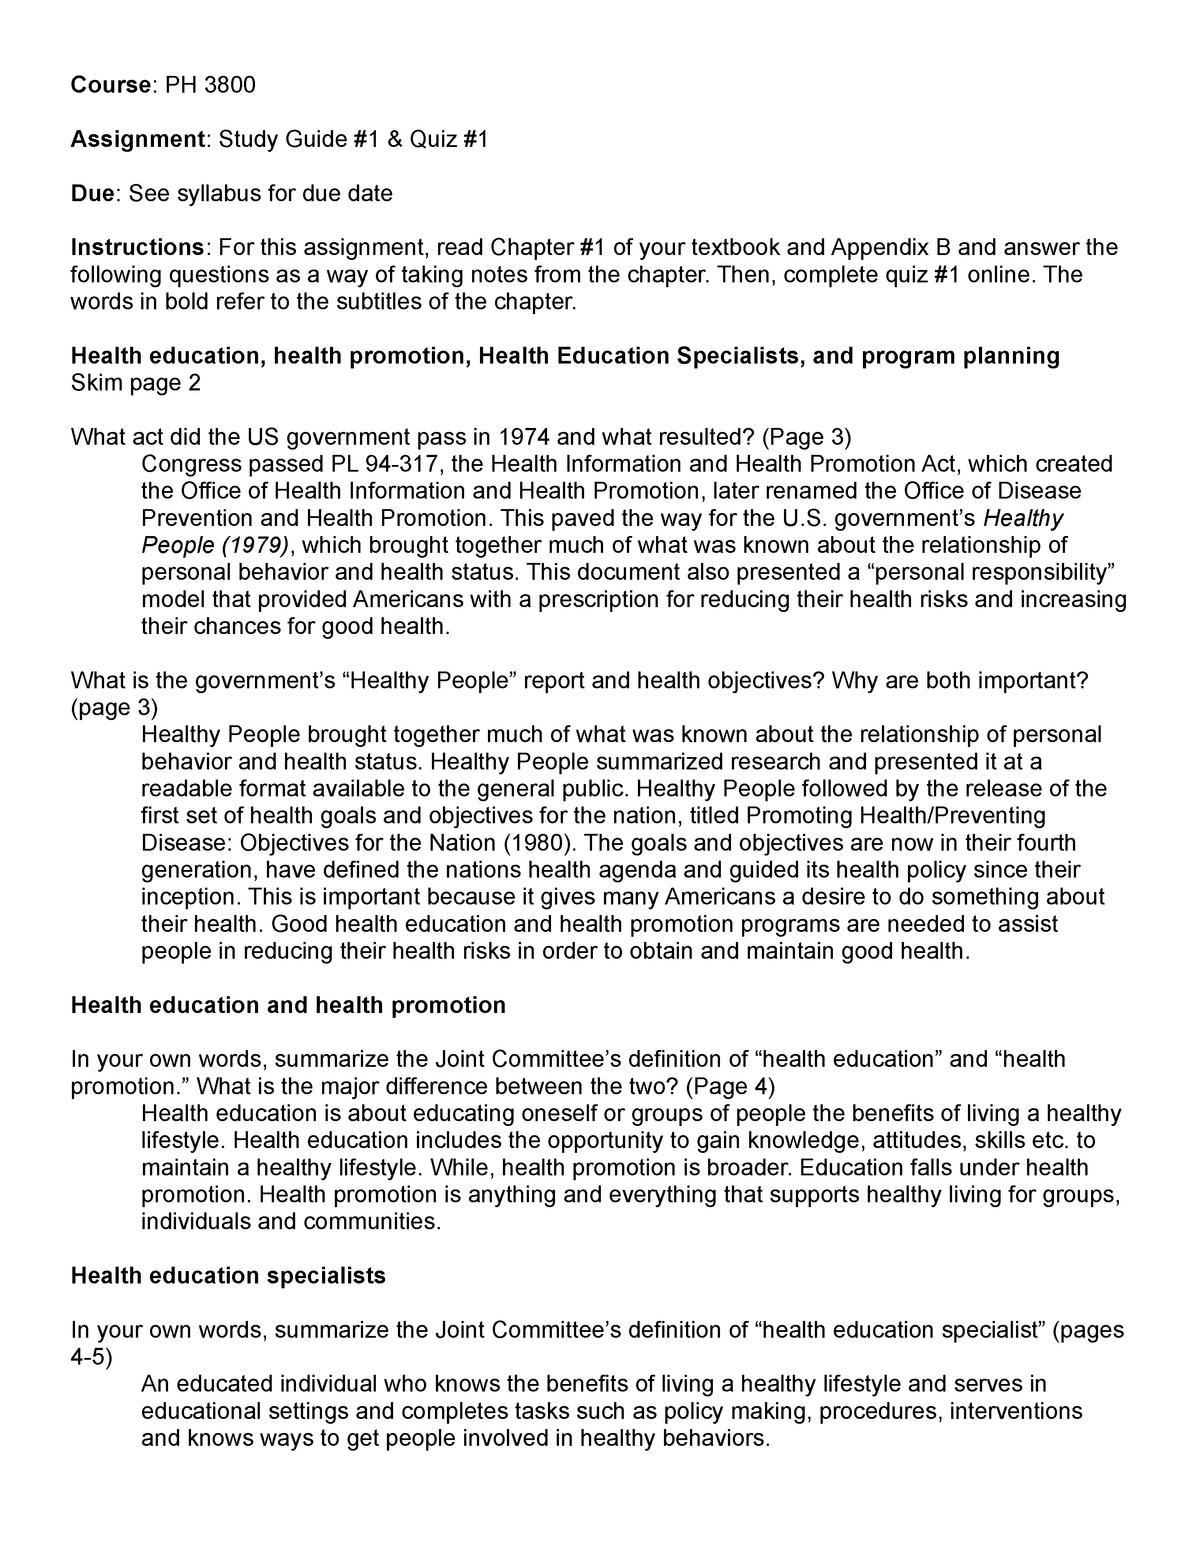 Study Guide #1 PH Intervention 1 - PH 3800 - App State - StuDocu